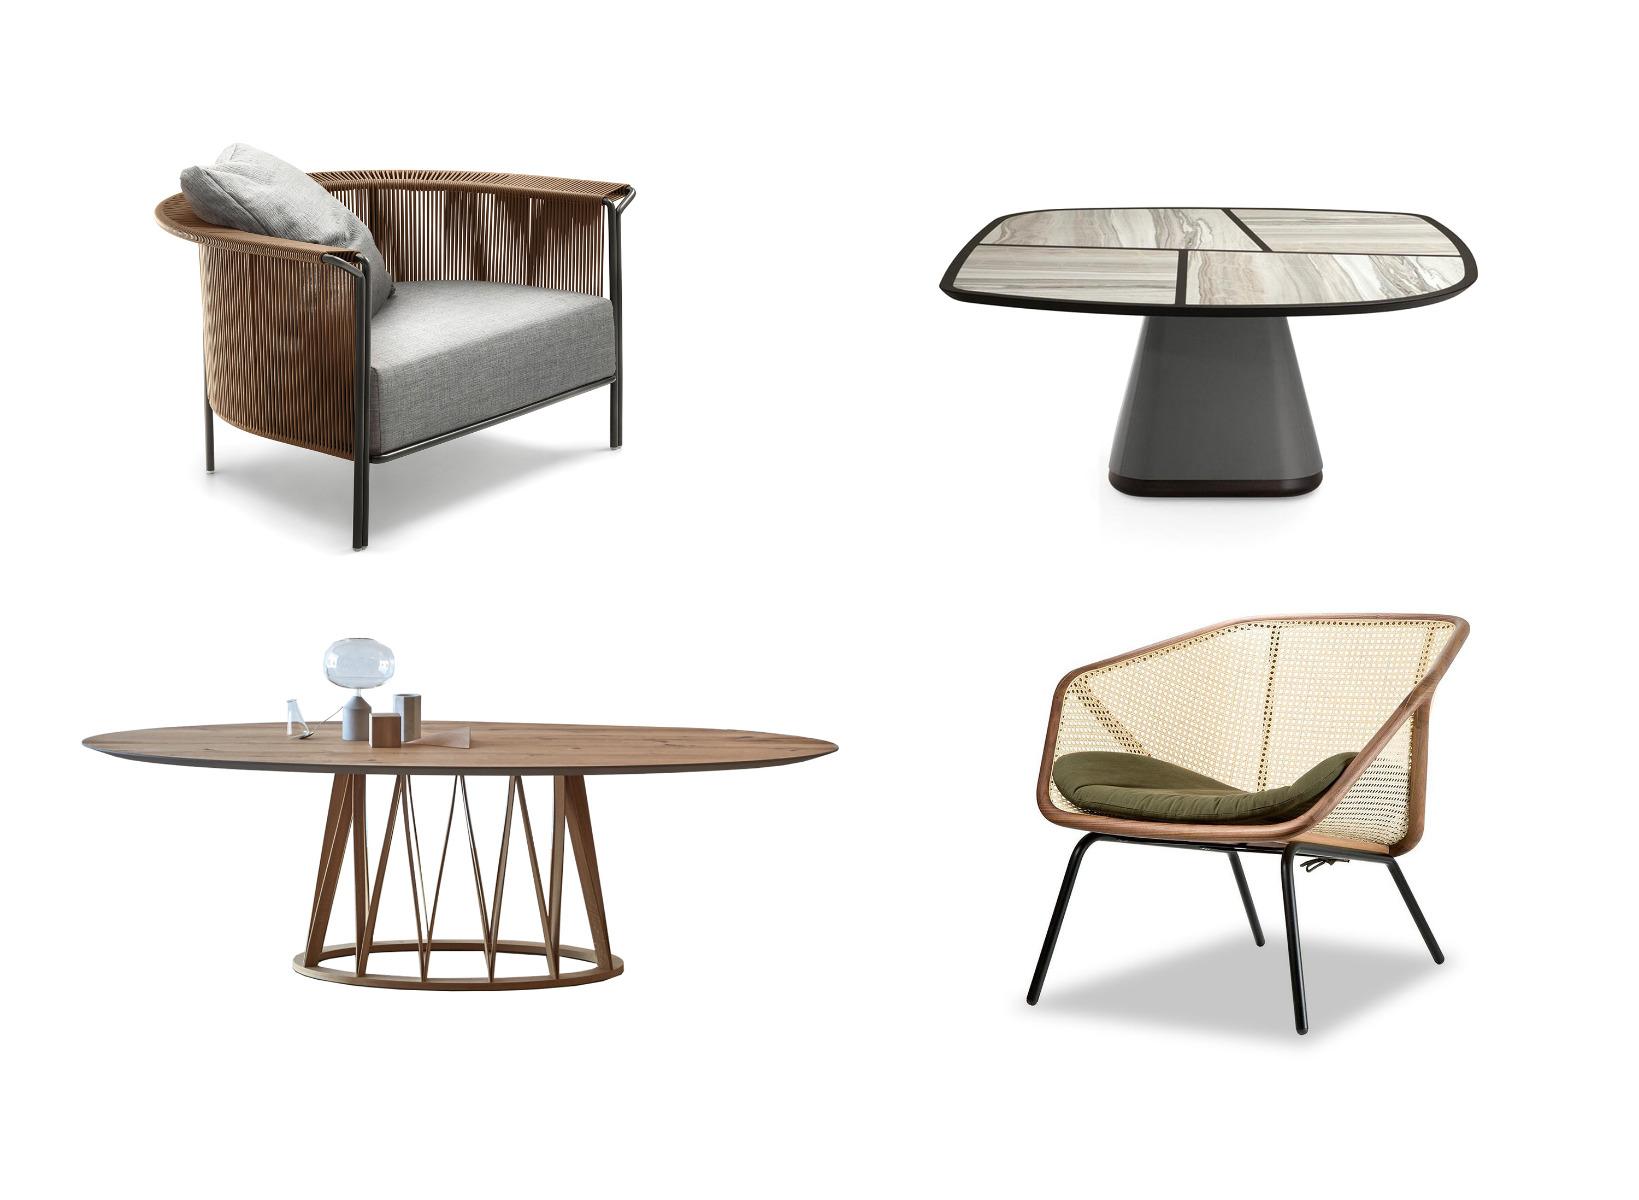 Giorgetti Disegual Table, Lema Alton Armchair, Miniforms Acco Table, Miniforms Colony Armchair